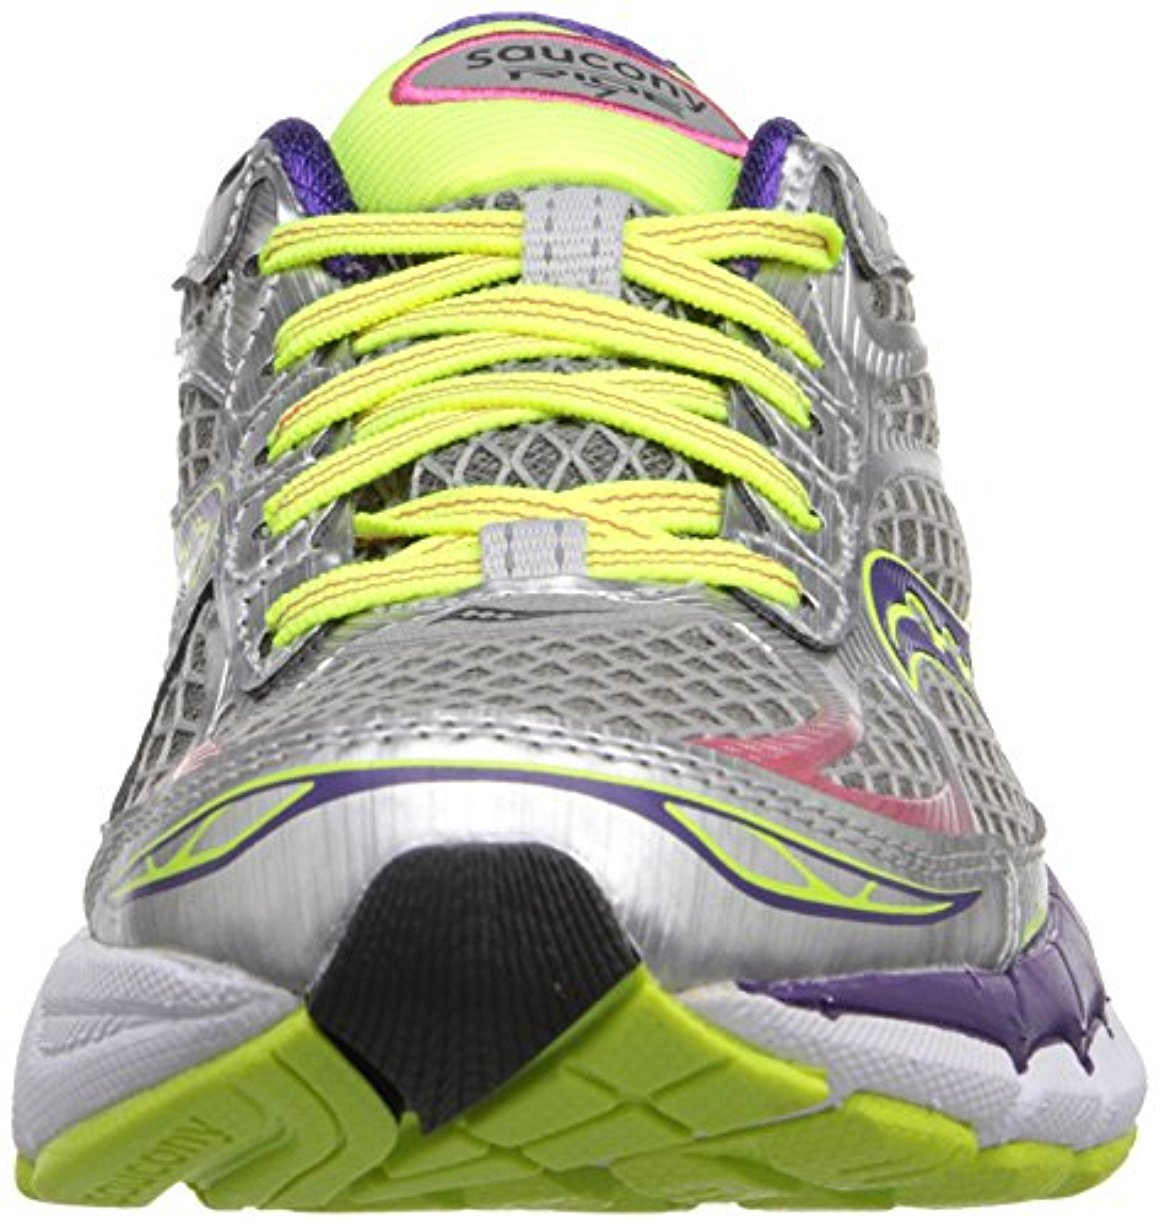 Saucony Women's Ride 7 Running Shoe,5 N US,Silver/Purple/Citron